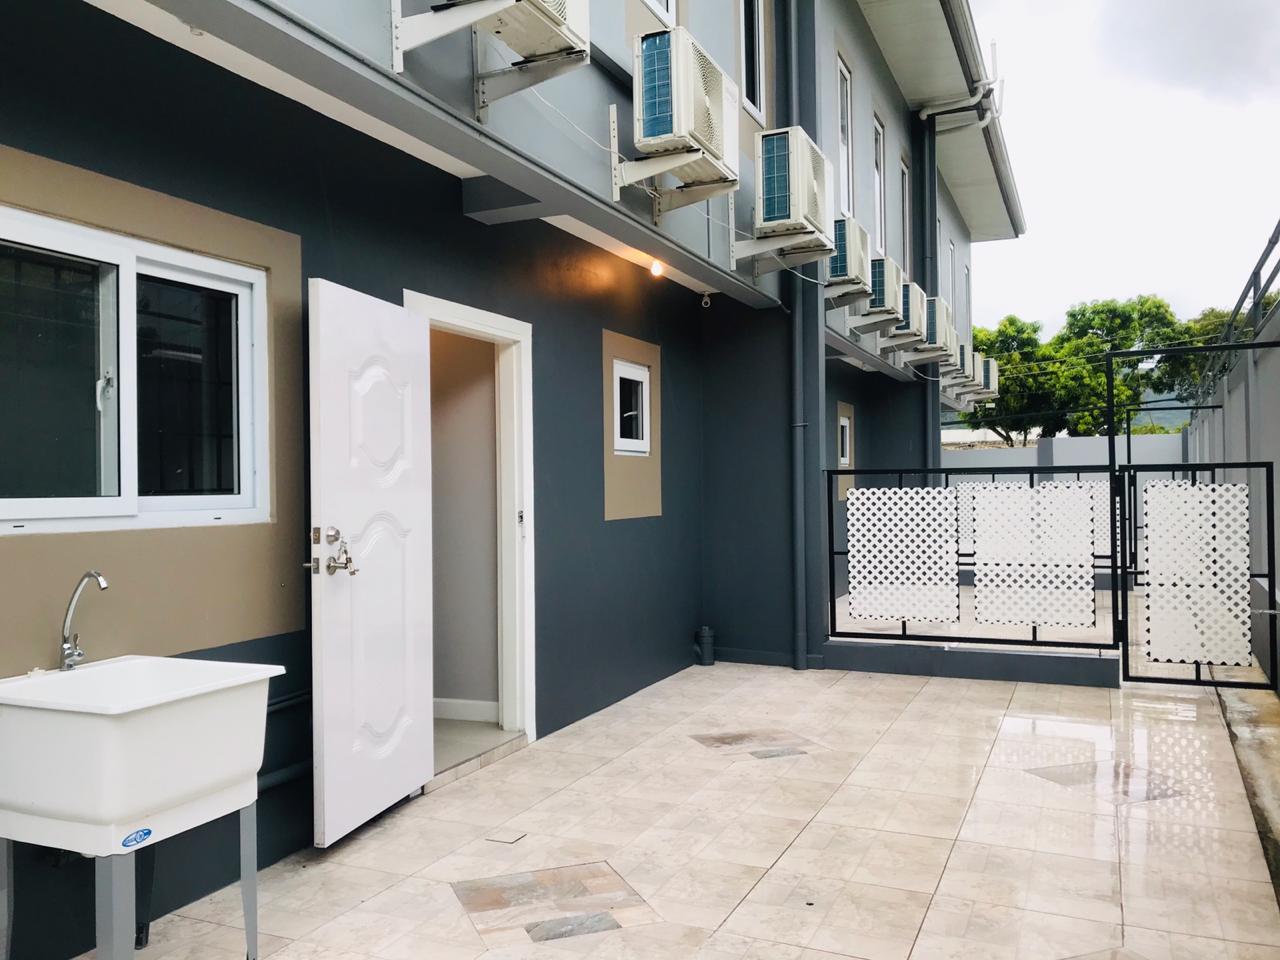 Santa Cruz New Townhouse for Sale